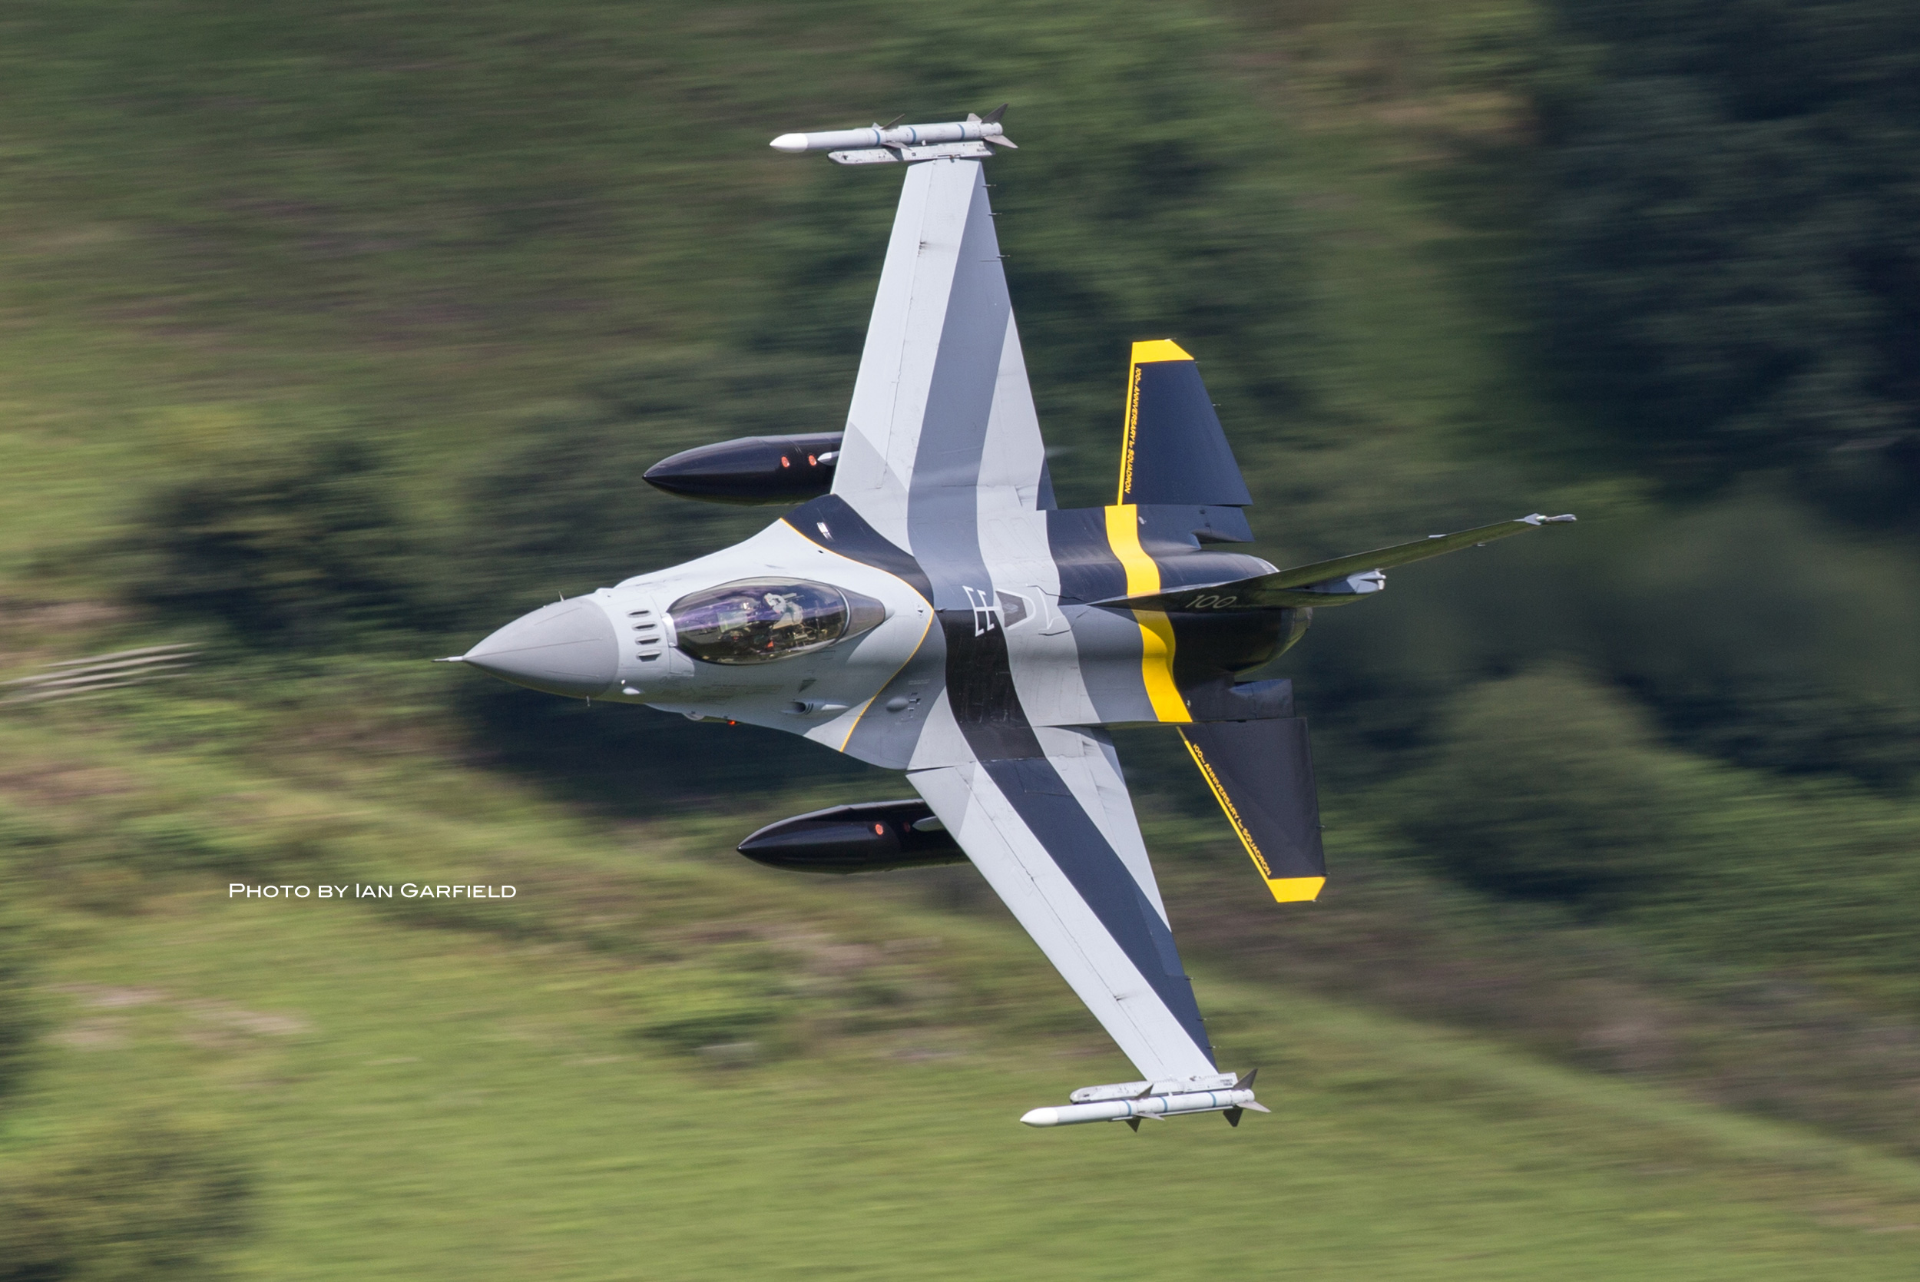 F16_IAN_GARFIELD_web